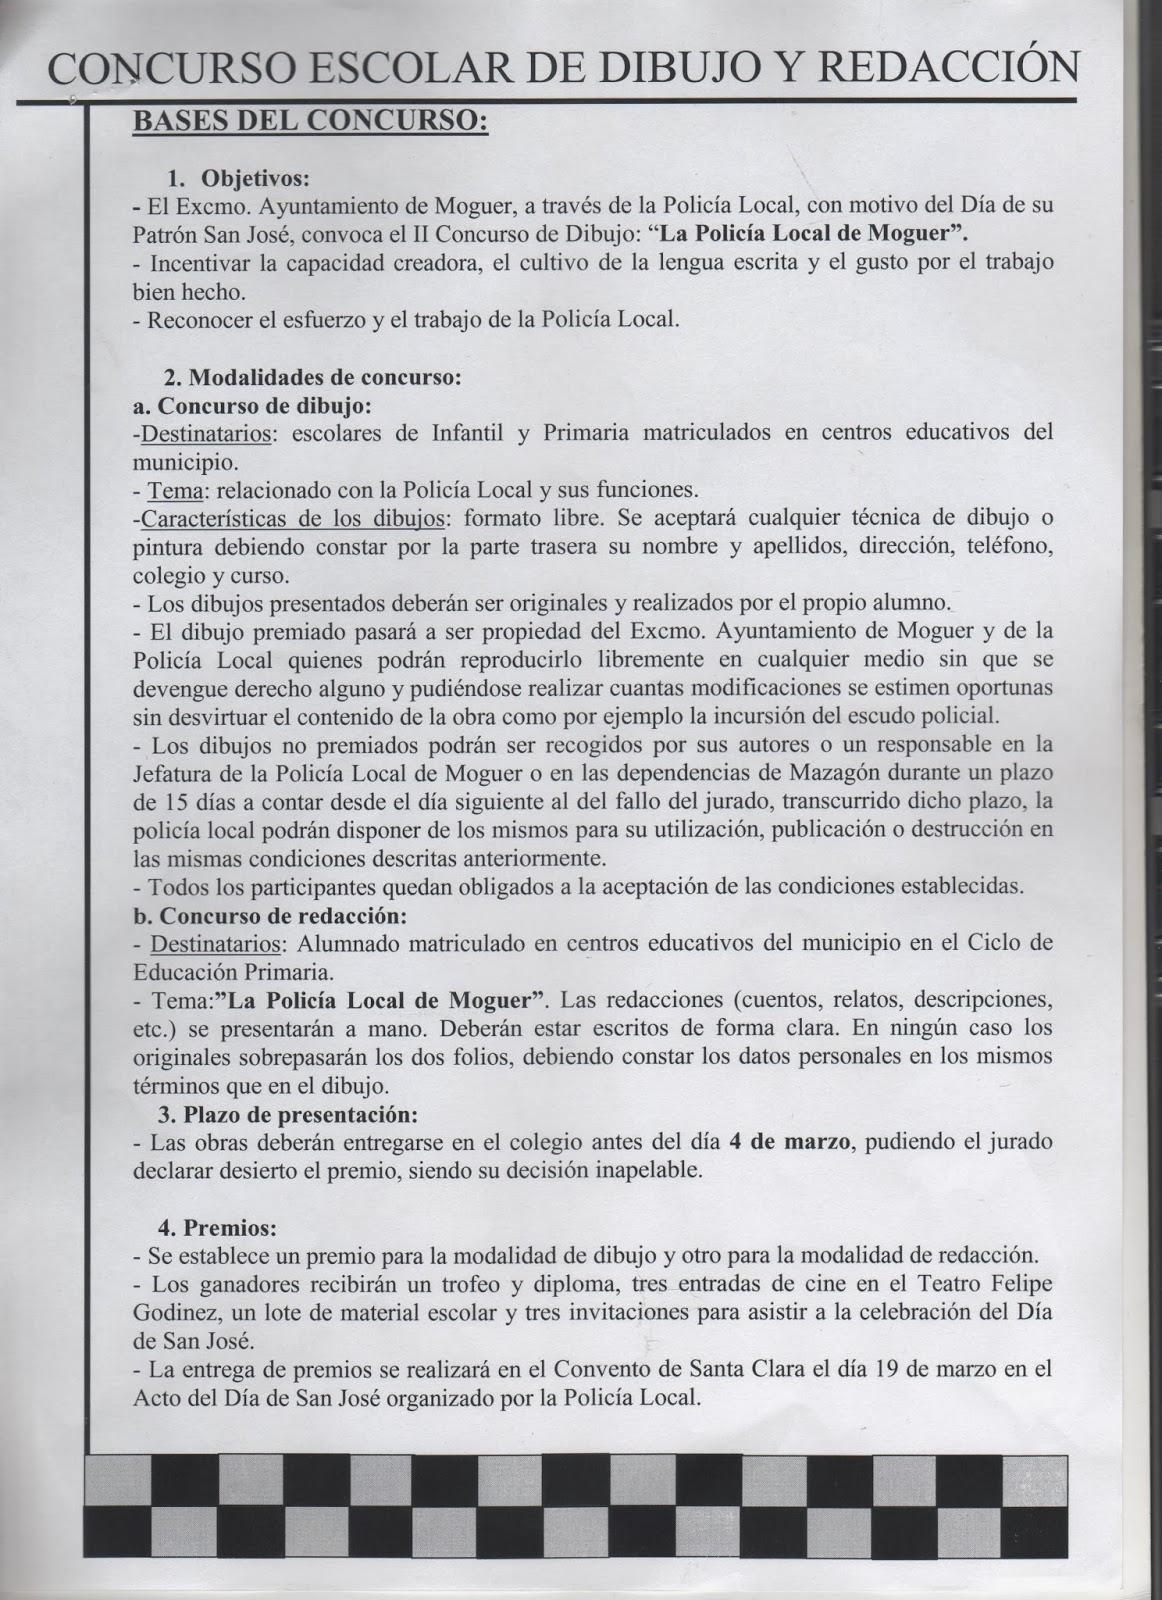 MAZAGN BEACH  CONCURSO ESCOLAR DE DIBUJO Y REDACCIN